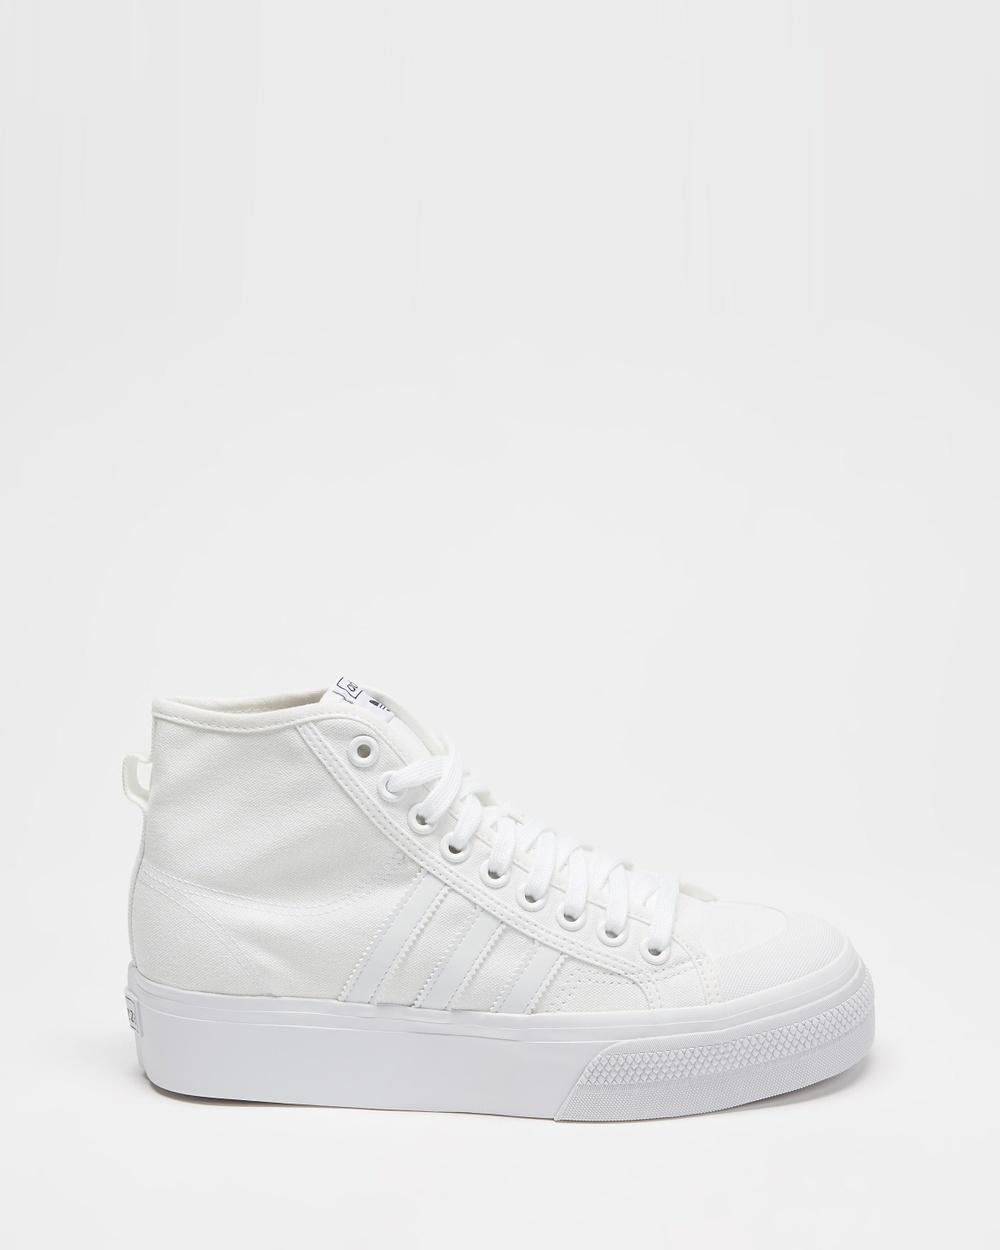 adidas Originals Nizza Hi Platform Women's Lifestyle Sneakers Footwear White, Footwear White & White